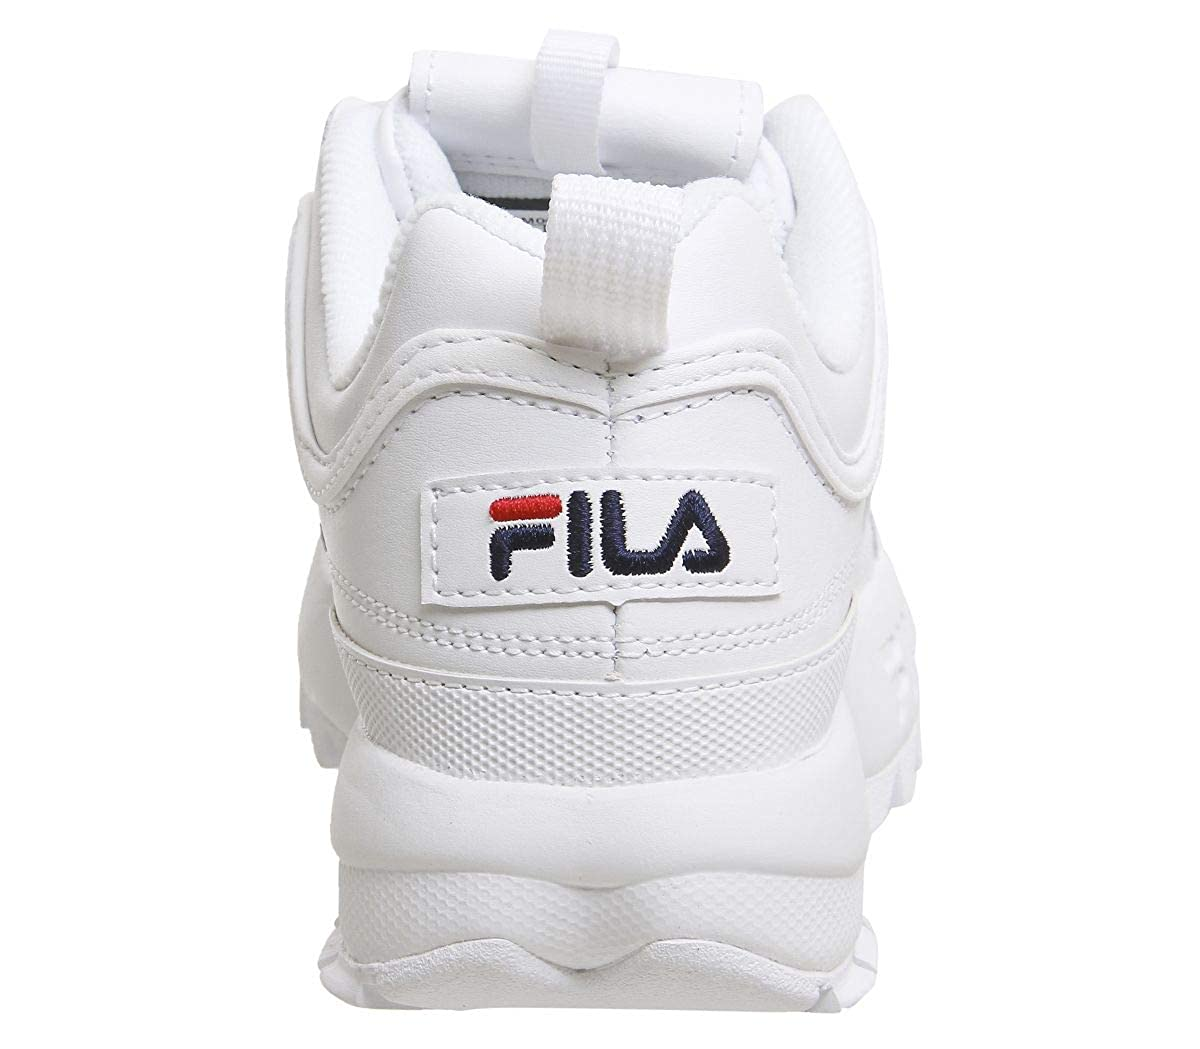 Ii Disruptor Fila BasketChaussures Femmes Blanc Premium 0Onw8Pk